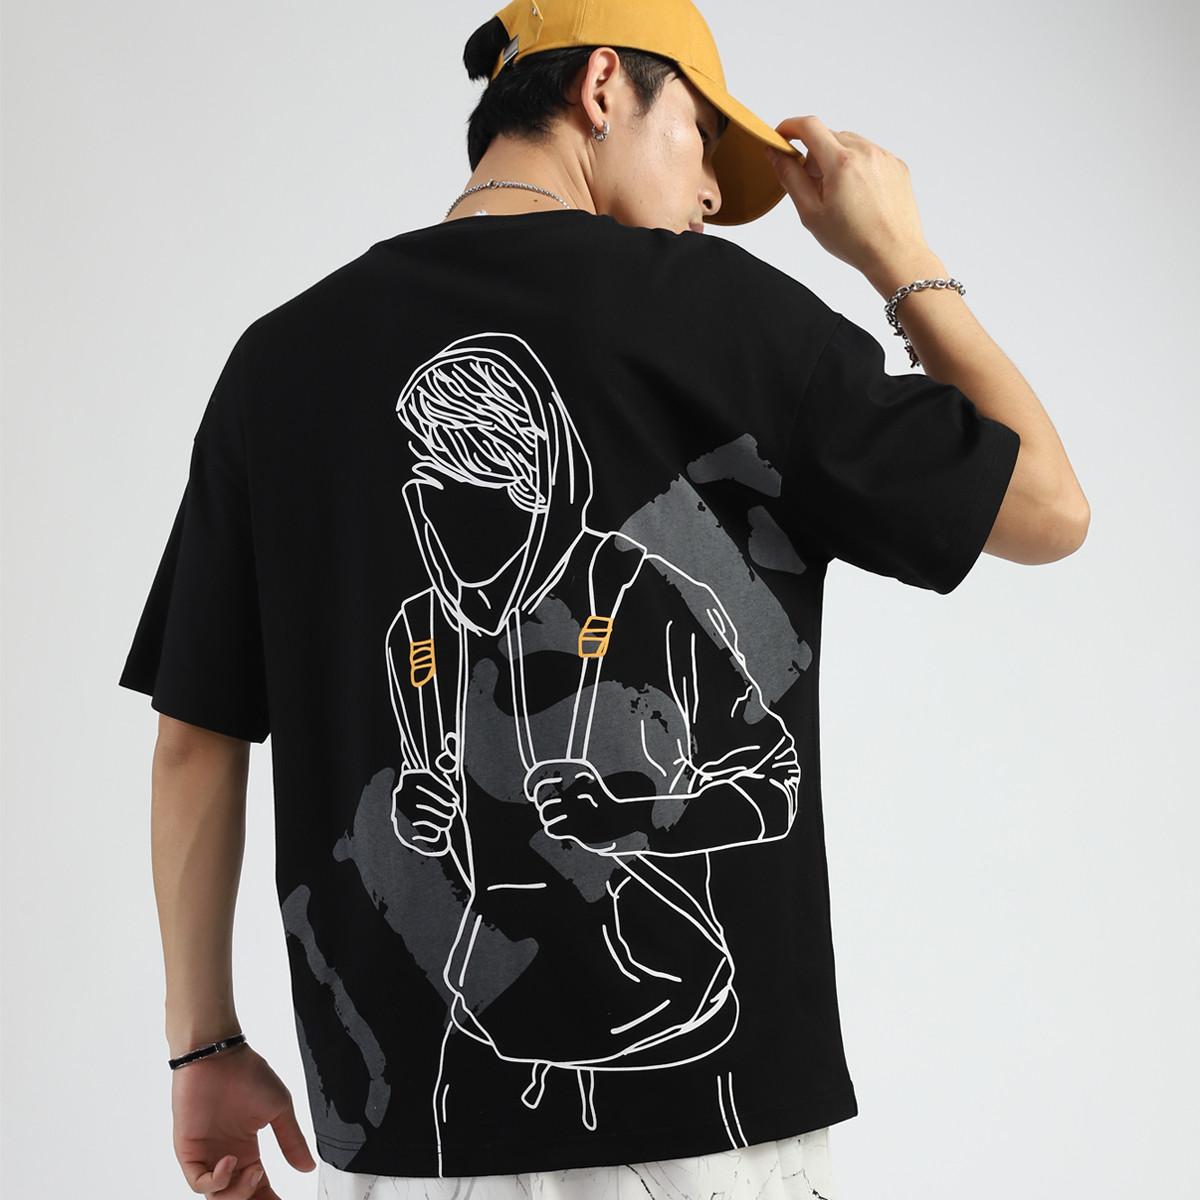 森马 ZA3A002212Y47-D037 男士t恤